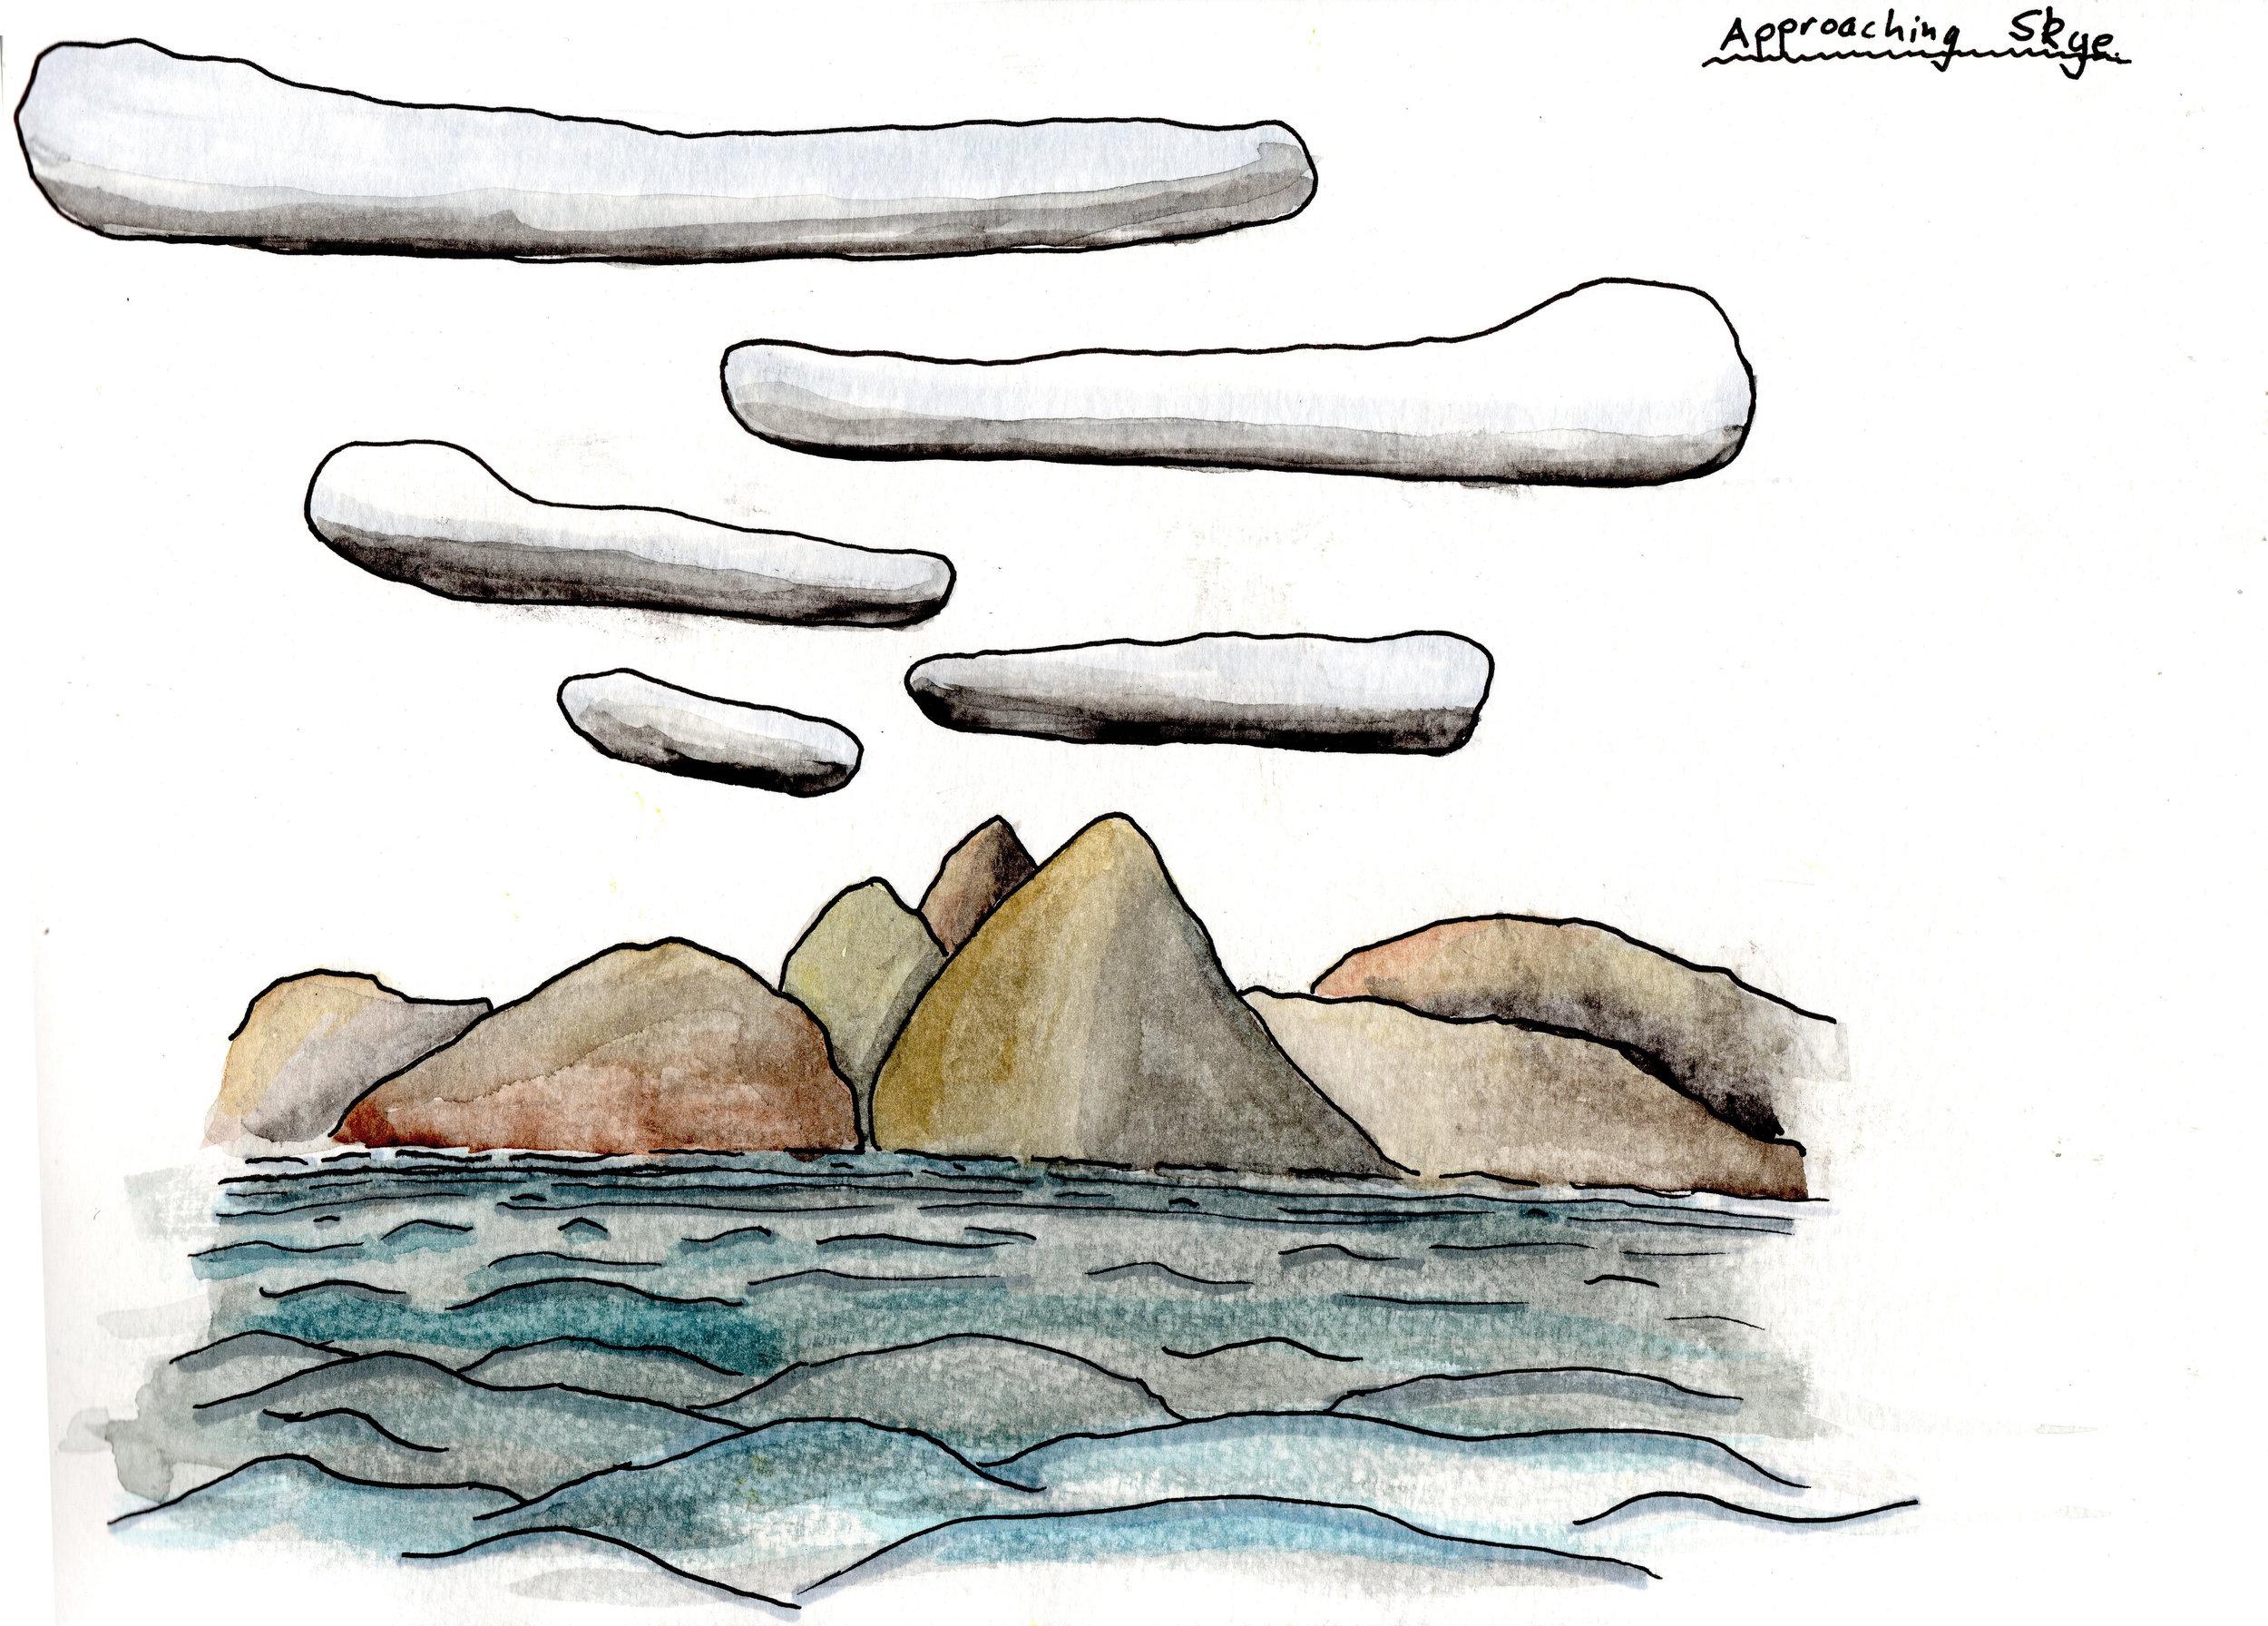 Approaching the Isle of Skye